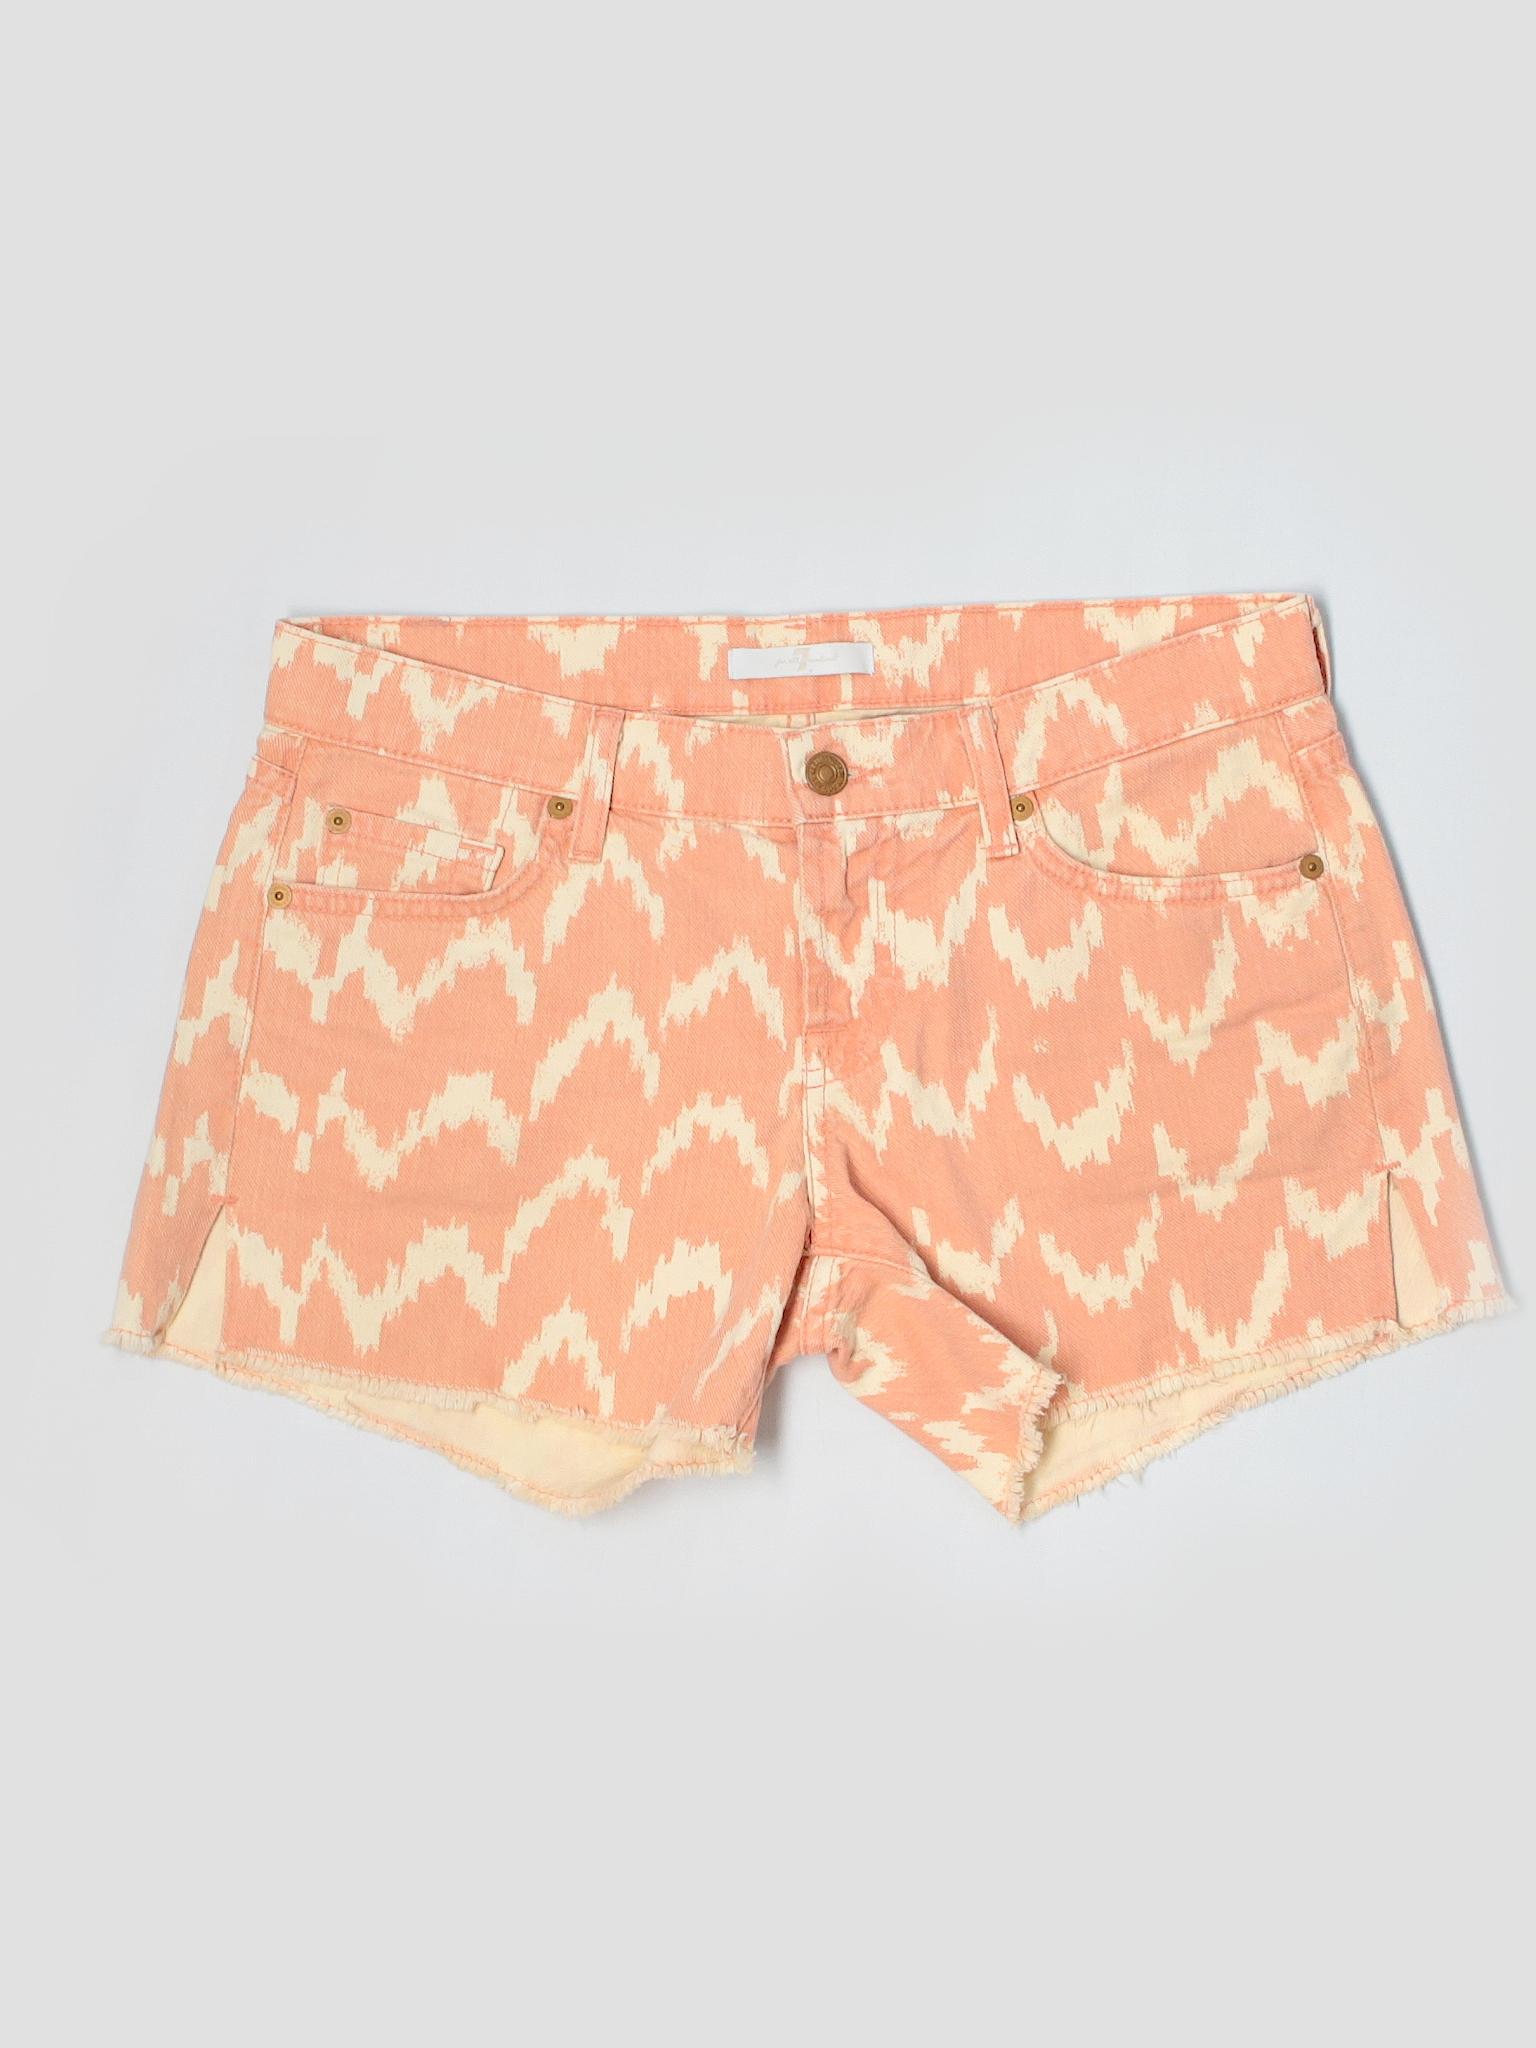 Shorts 7 Mankind For Boutique Denim All v1BC0nwq